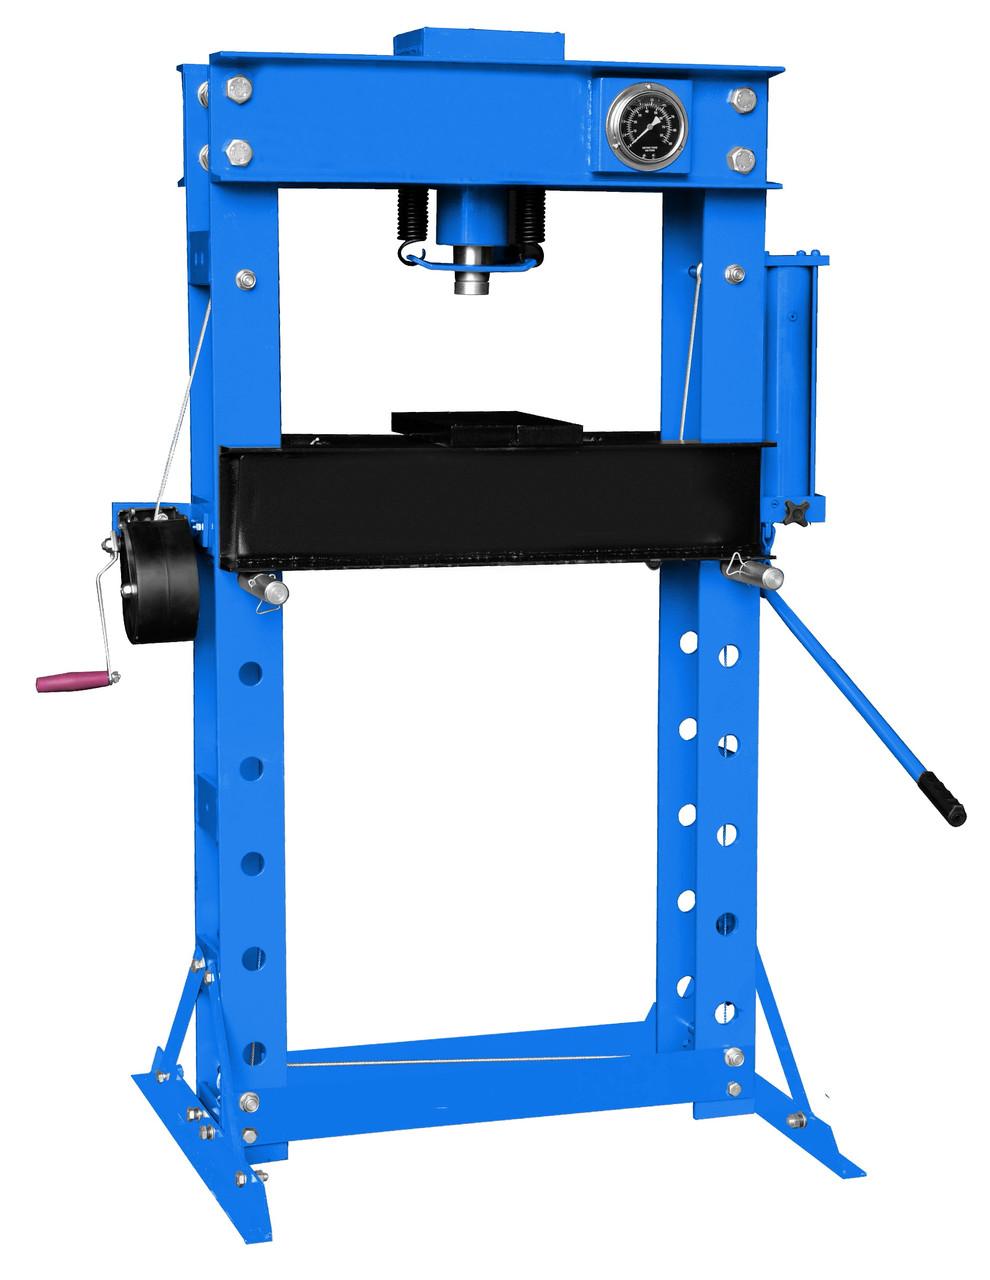 Пресс гидравлический ручная помпа 50тонн 9TY521-50D-B  KINGTONY